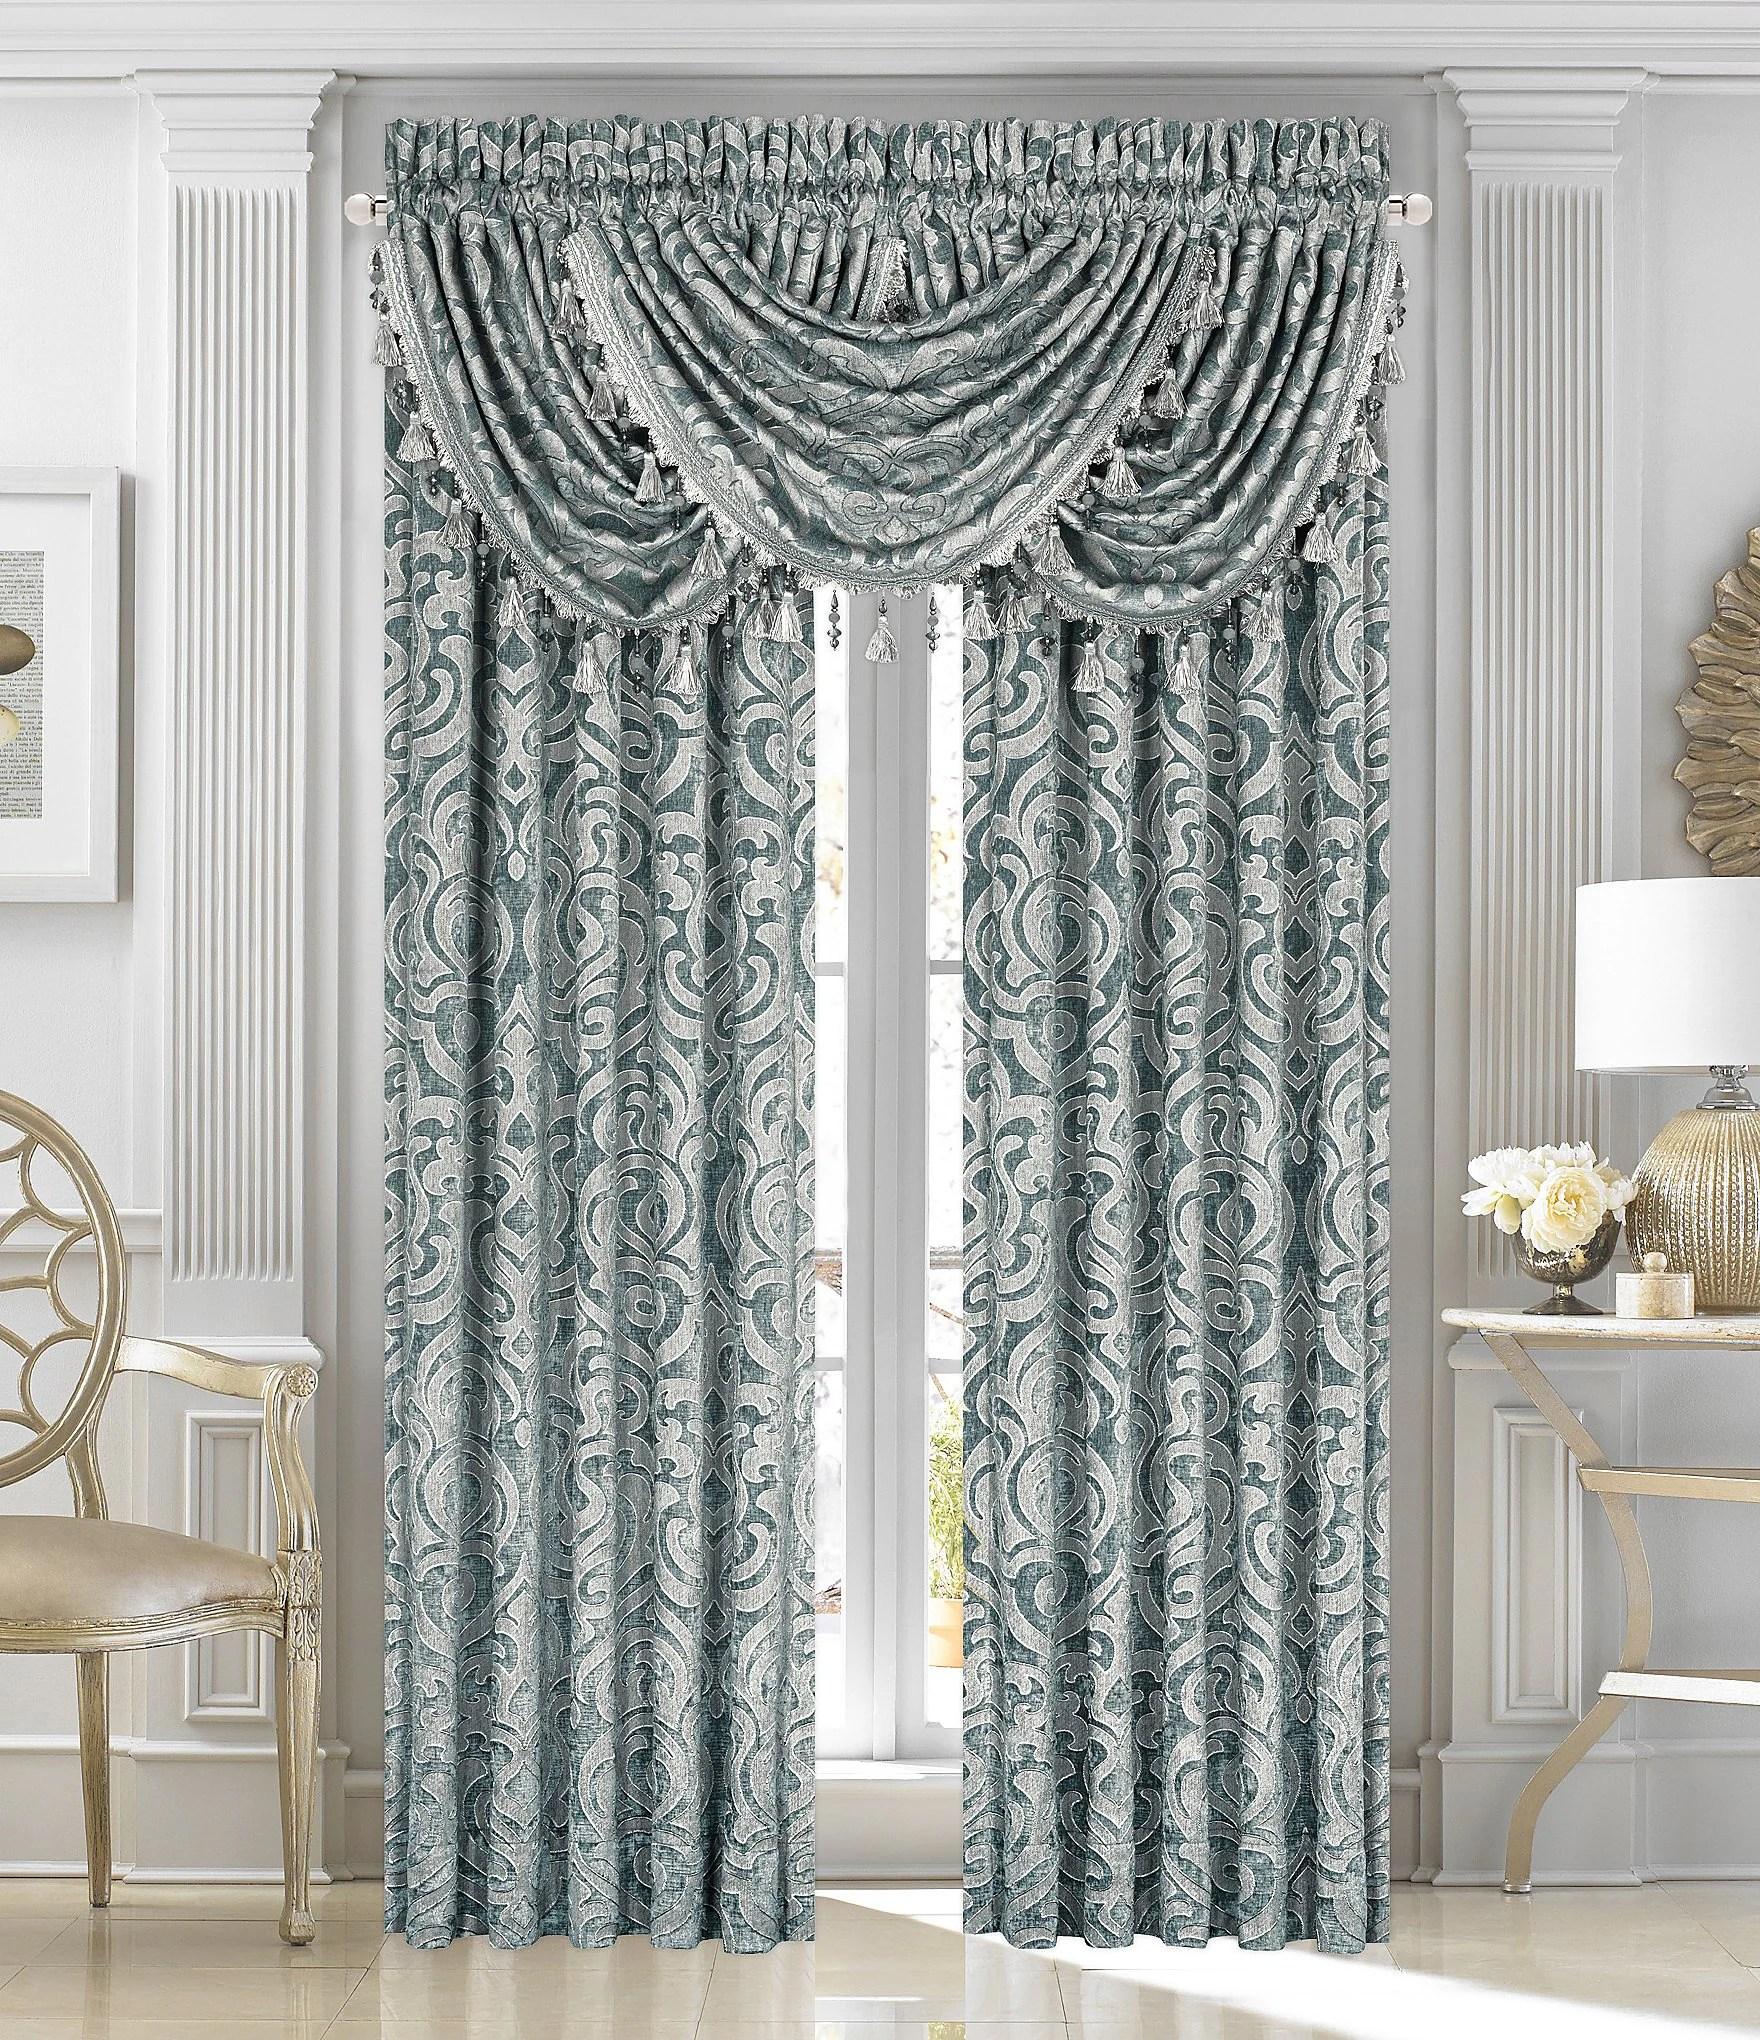 J Queen New York Sicily Window Treatments Dillards